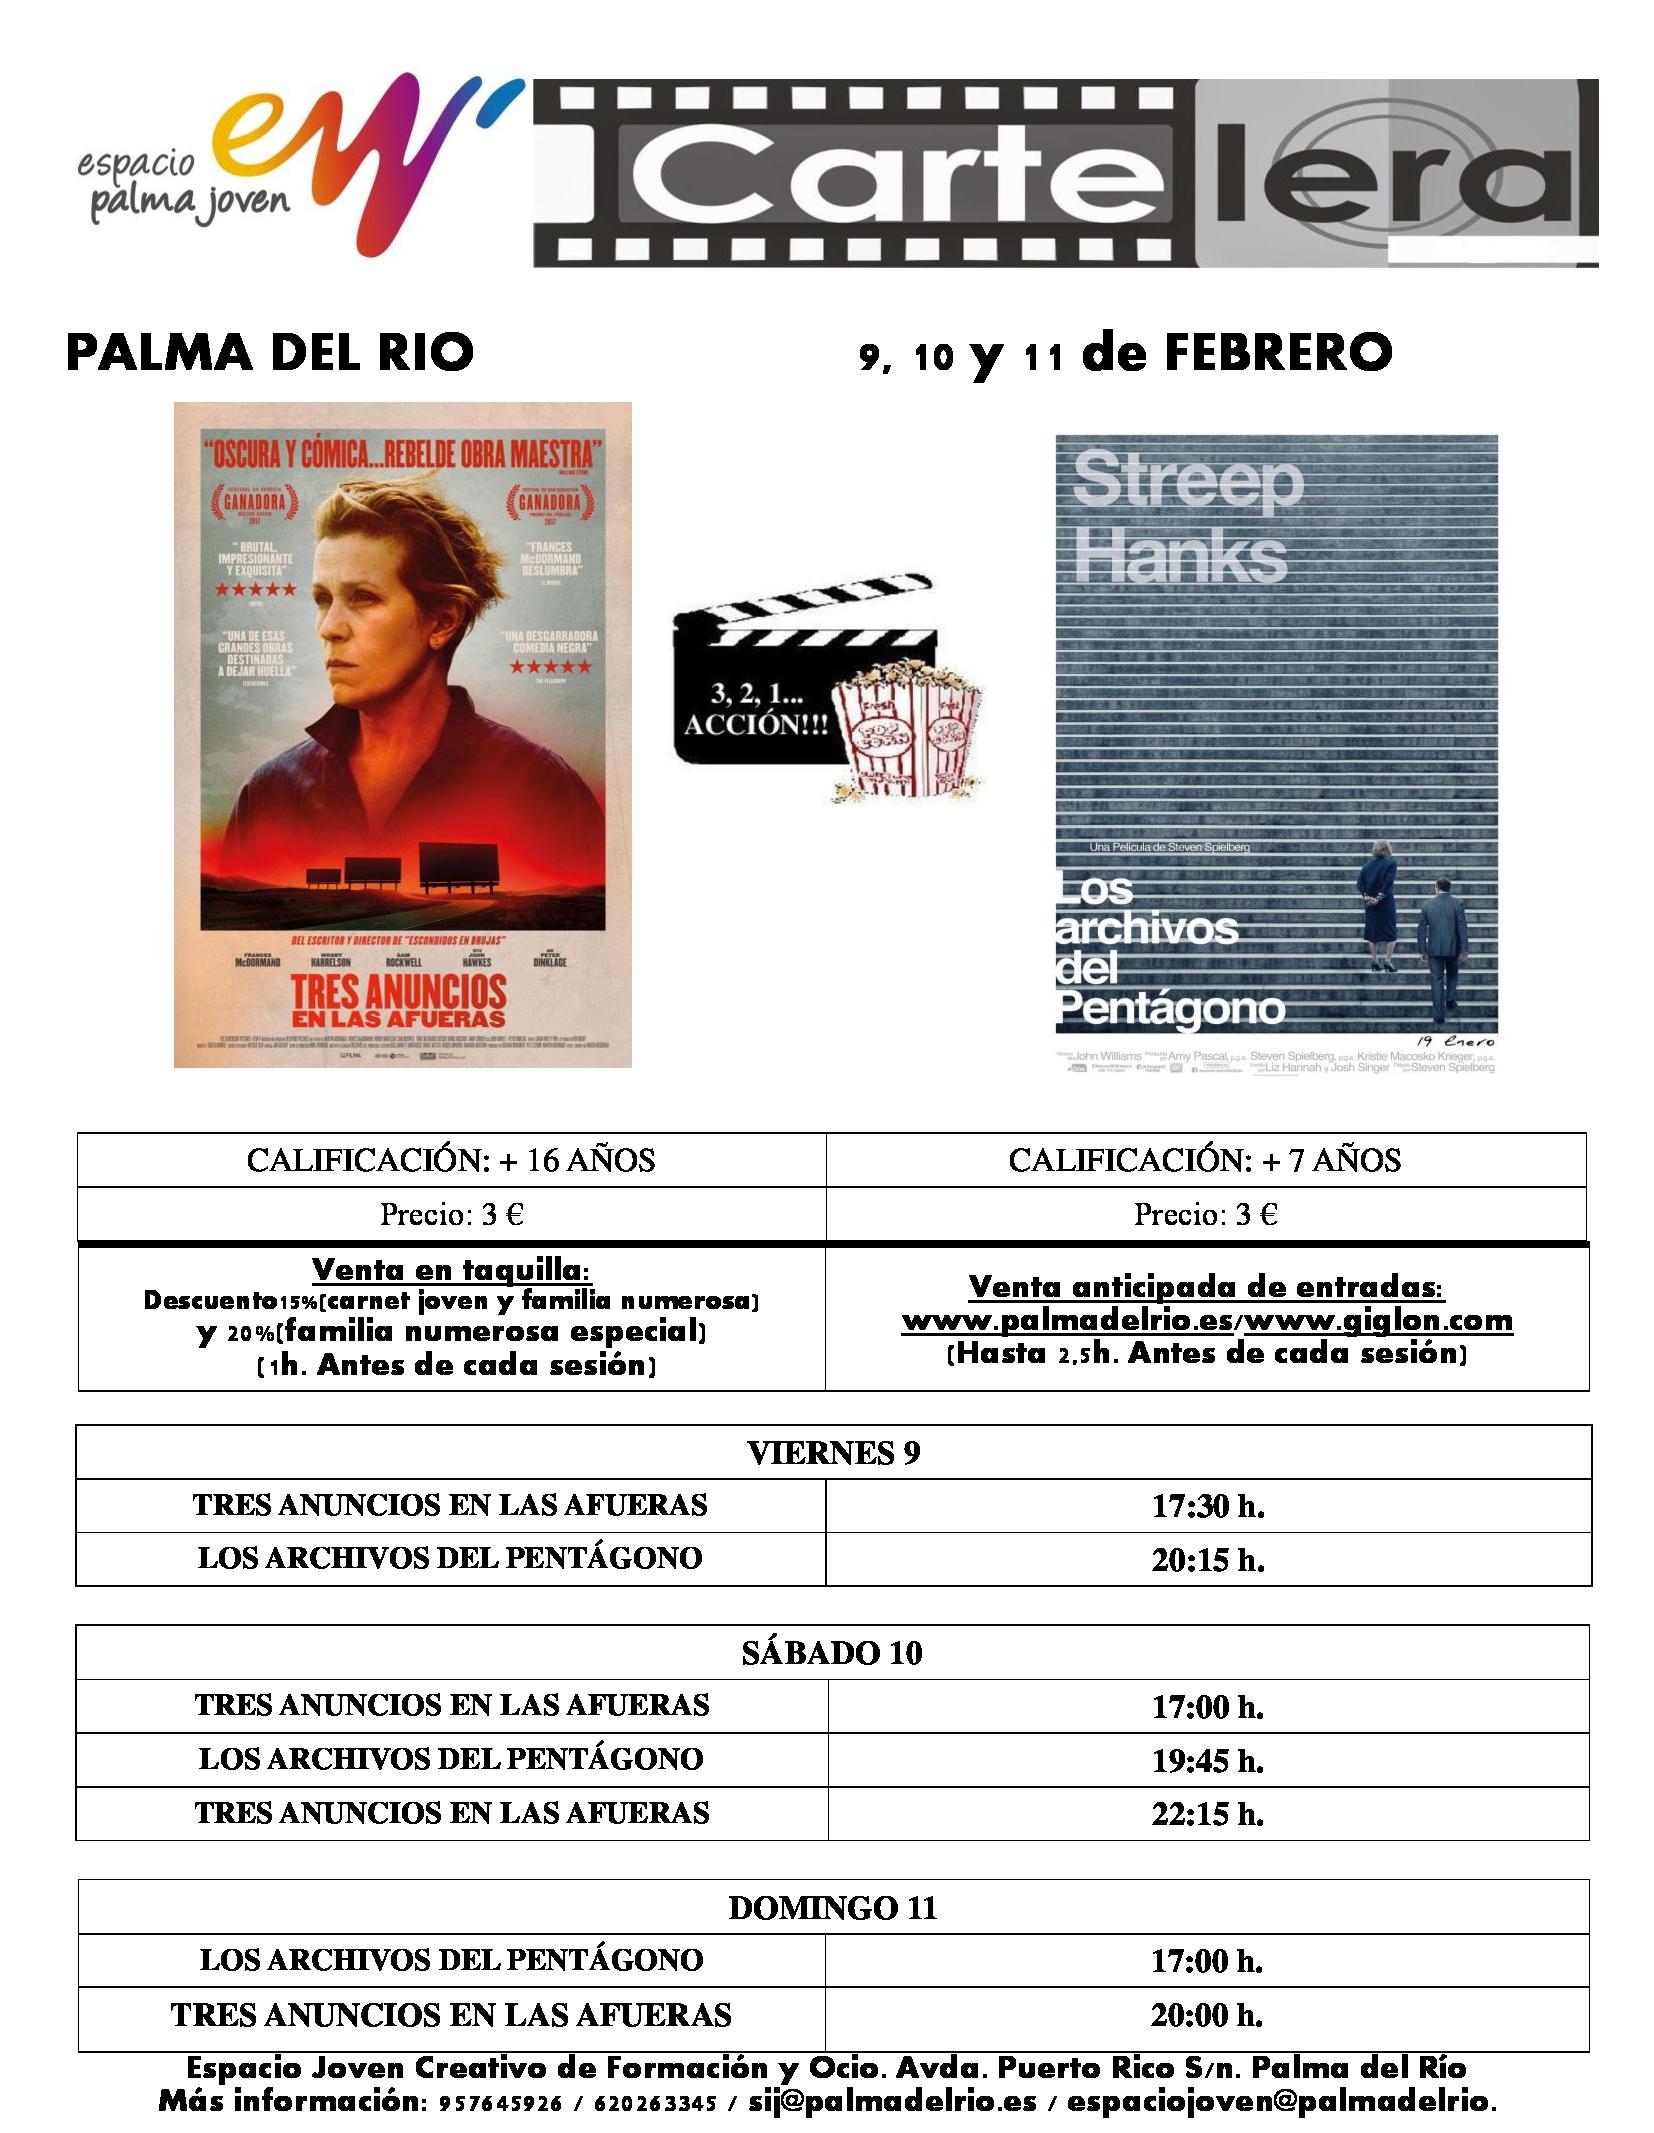 https://www.palmadelrio.es/sites/default/files/cartelera._9_10_y_11_febrero_2018.jpg